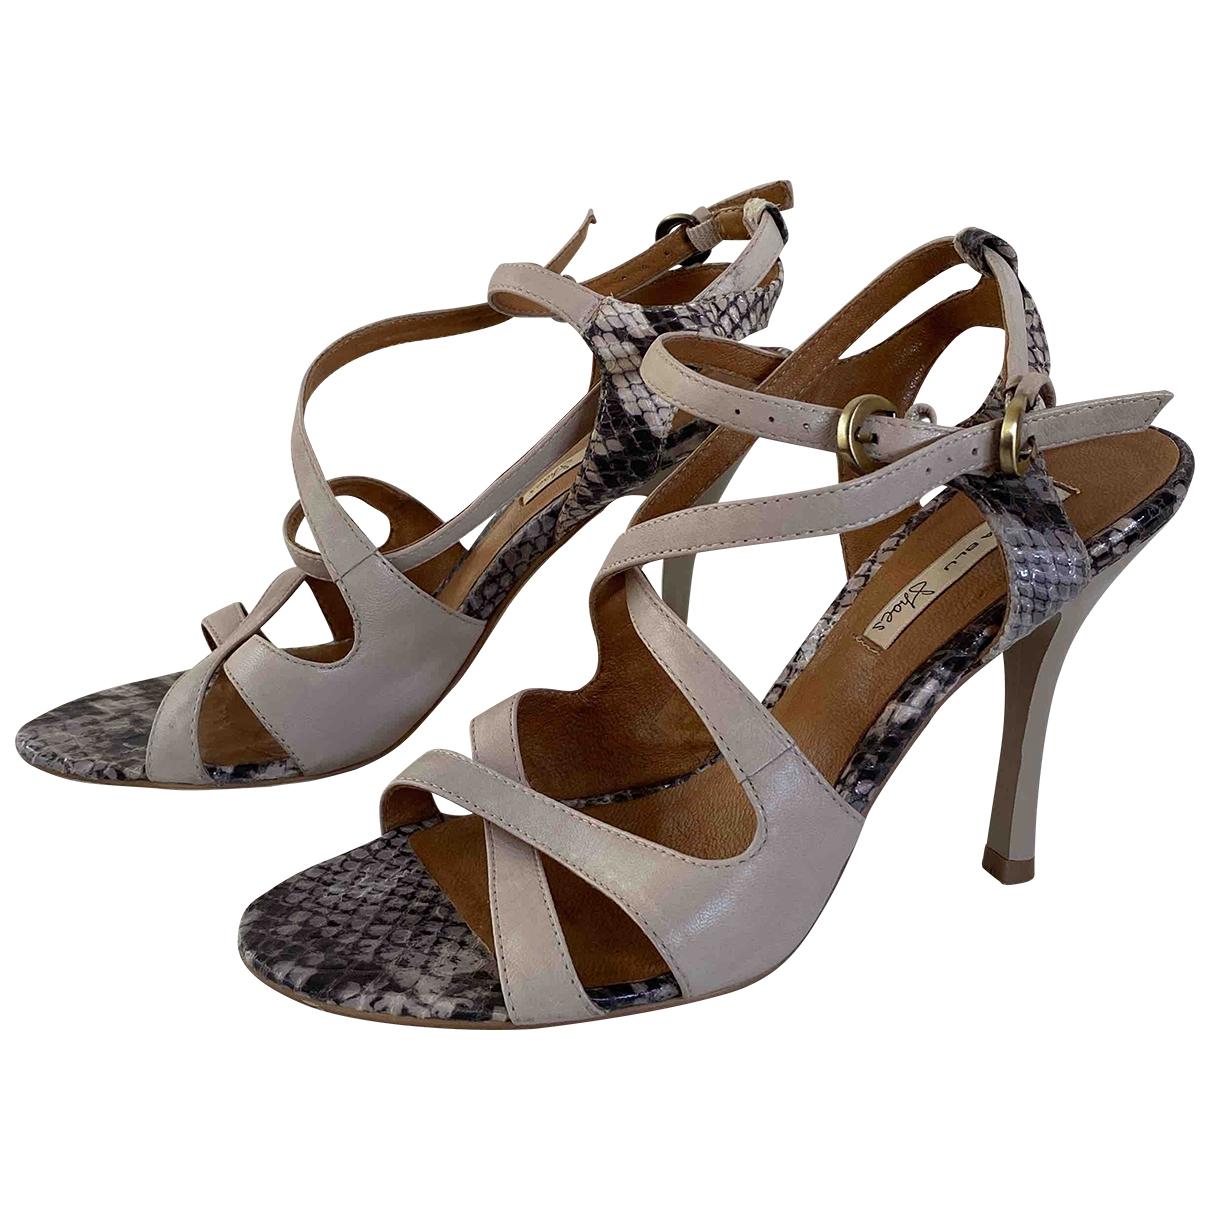 Tosca Blu - Sandales   pour femme en cuir - beige